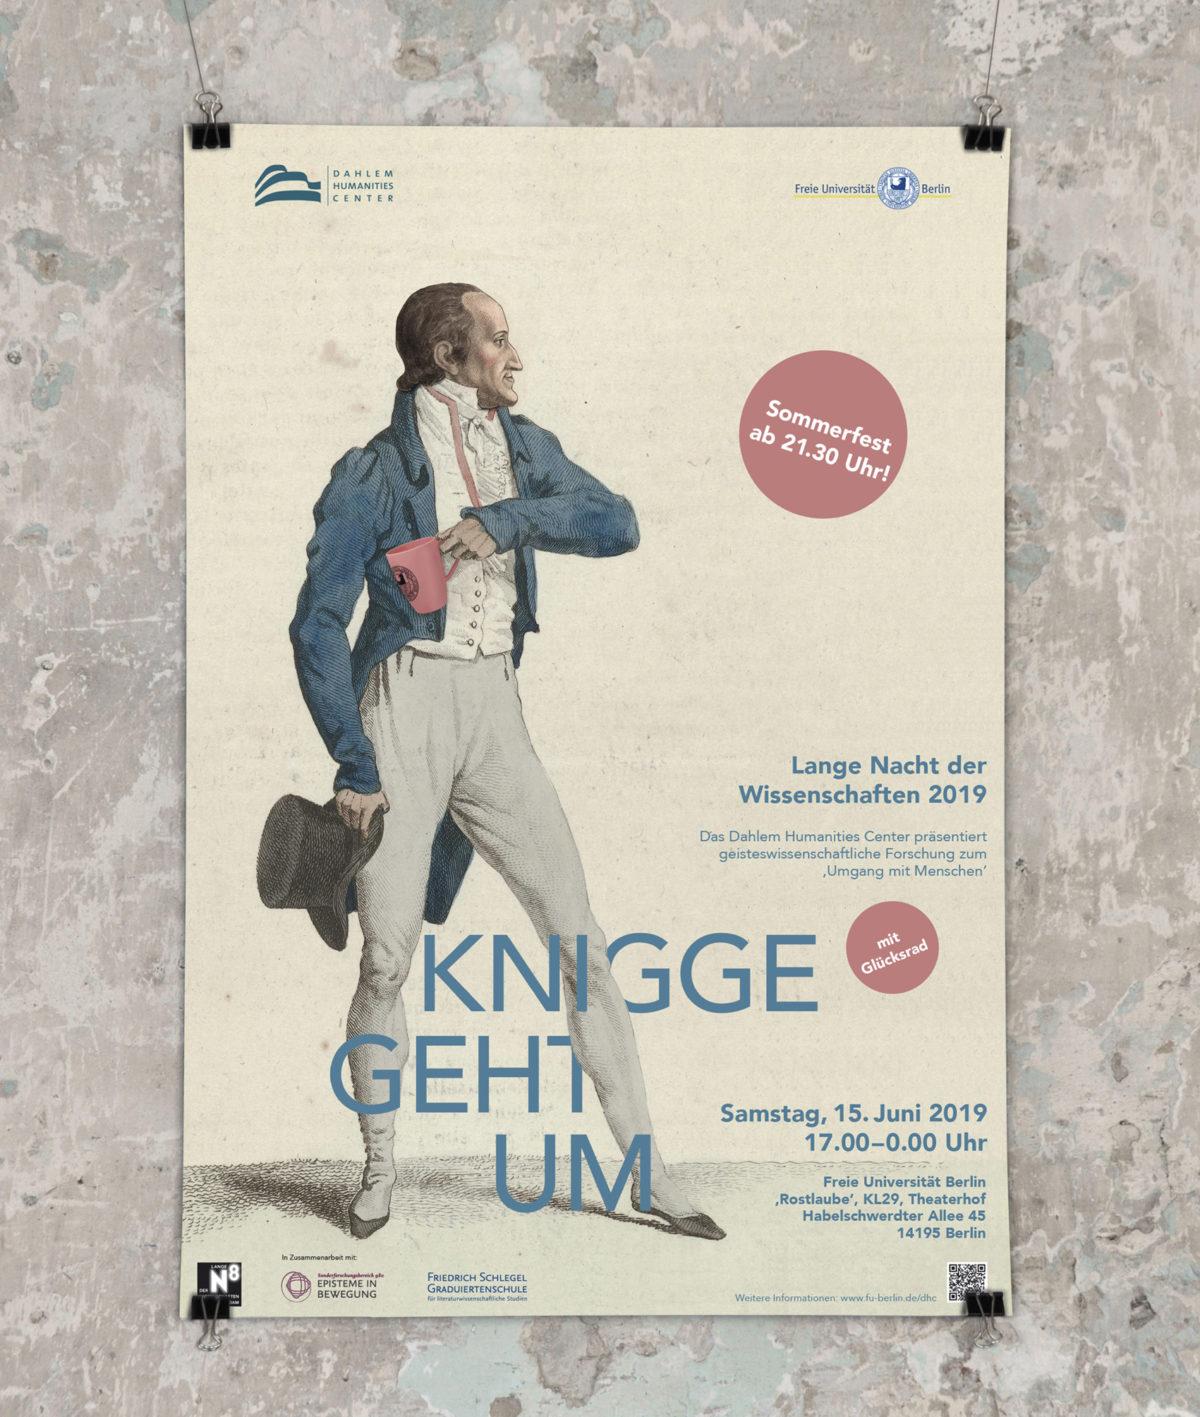 #Kniggegehtum, Poster zur Langen Nacht der Wissenschaften 2019, Dahlem Humanities Center, Freie Universität Berlin